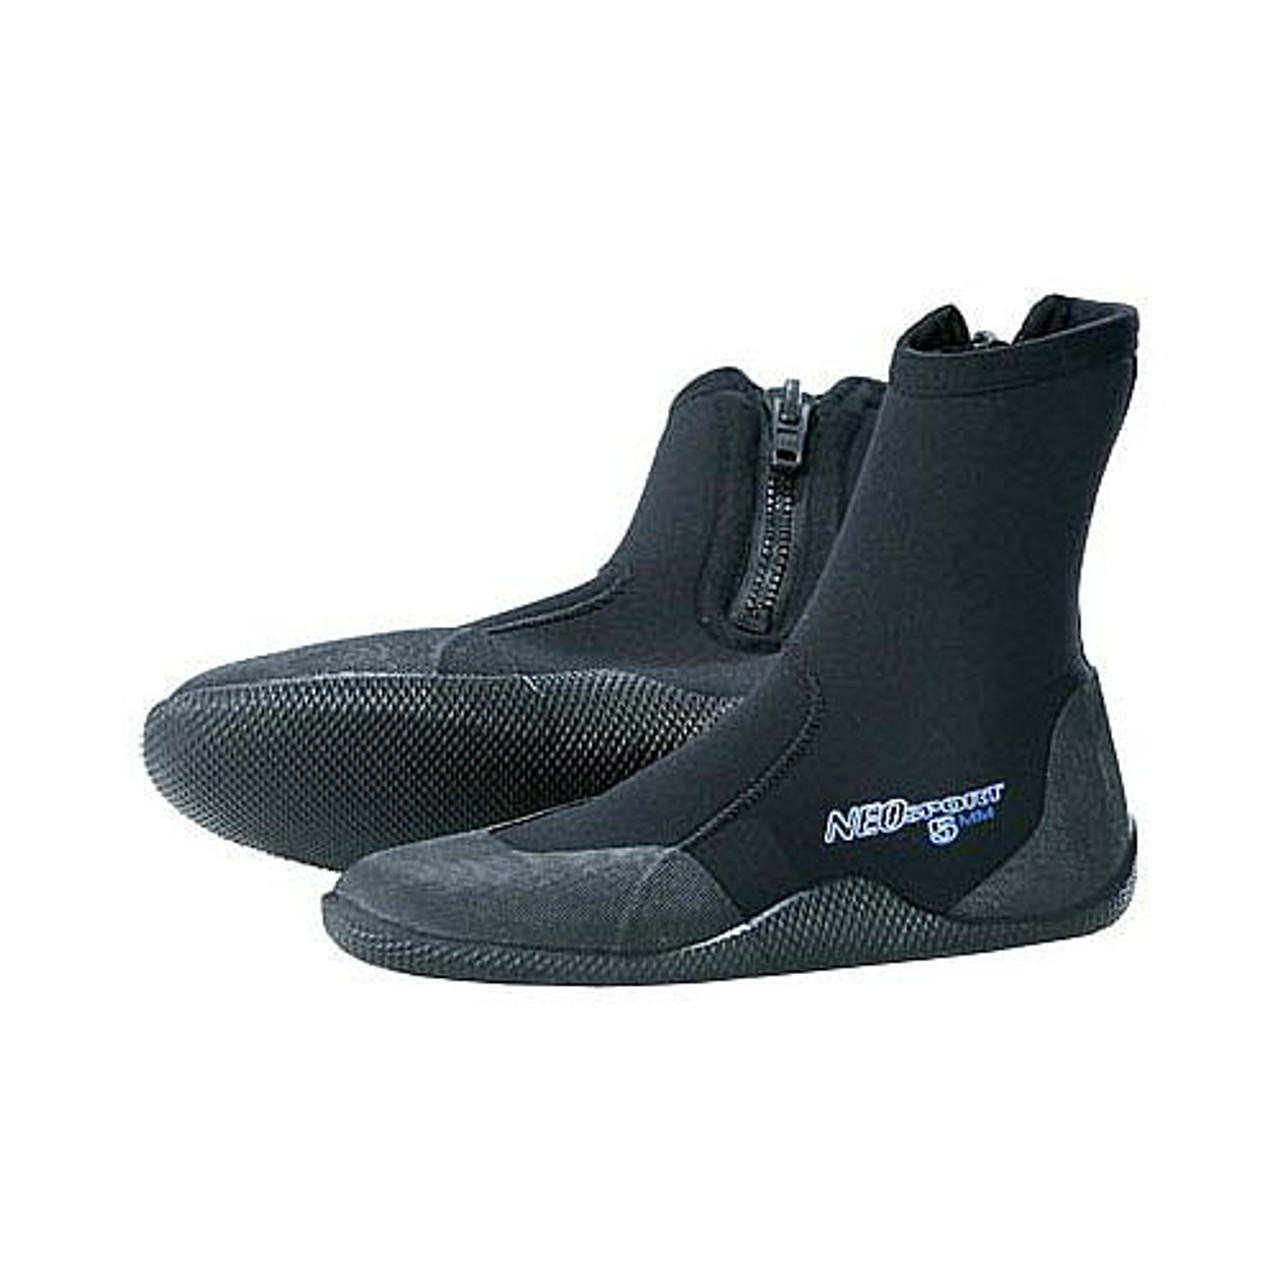 neosport high boot